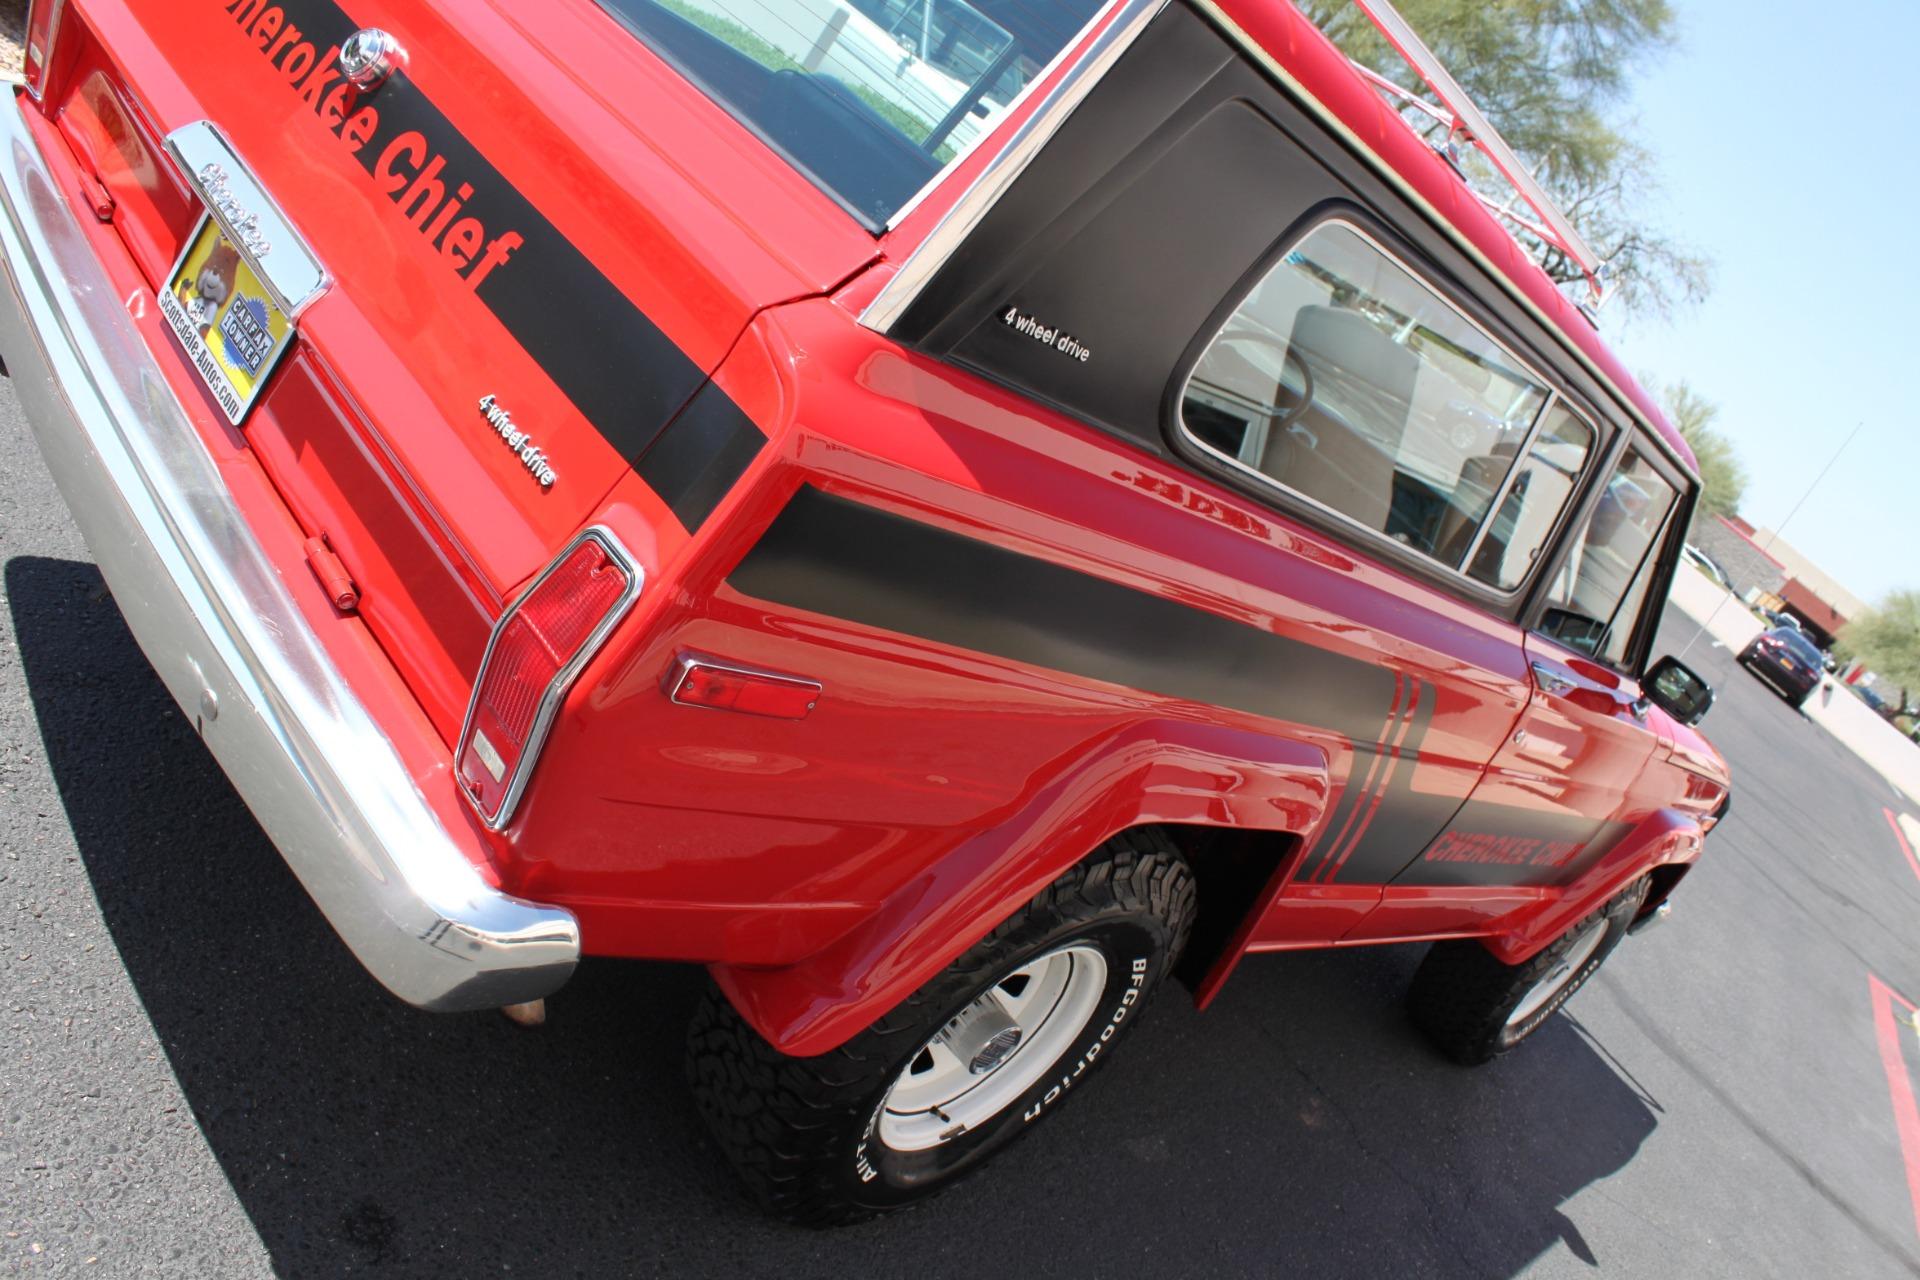 Used-1983-Jeep-Cherokee-Chief-4WD-Audi